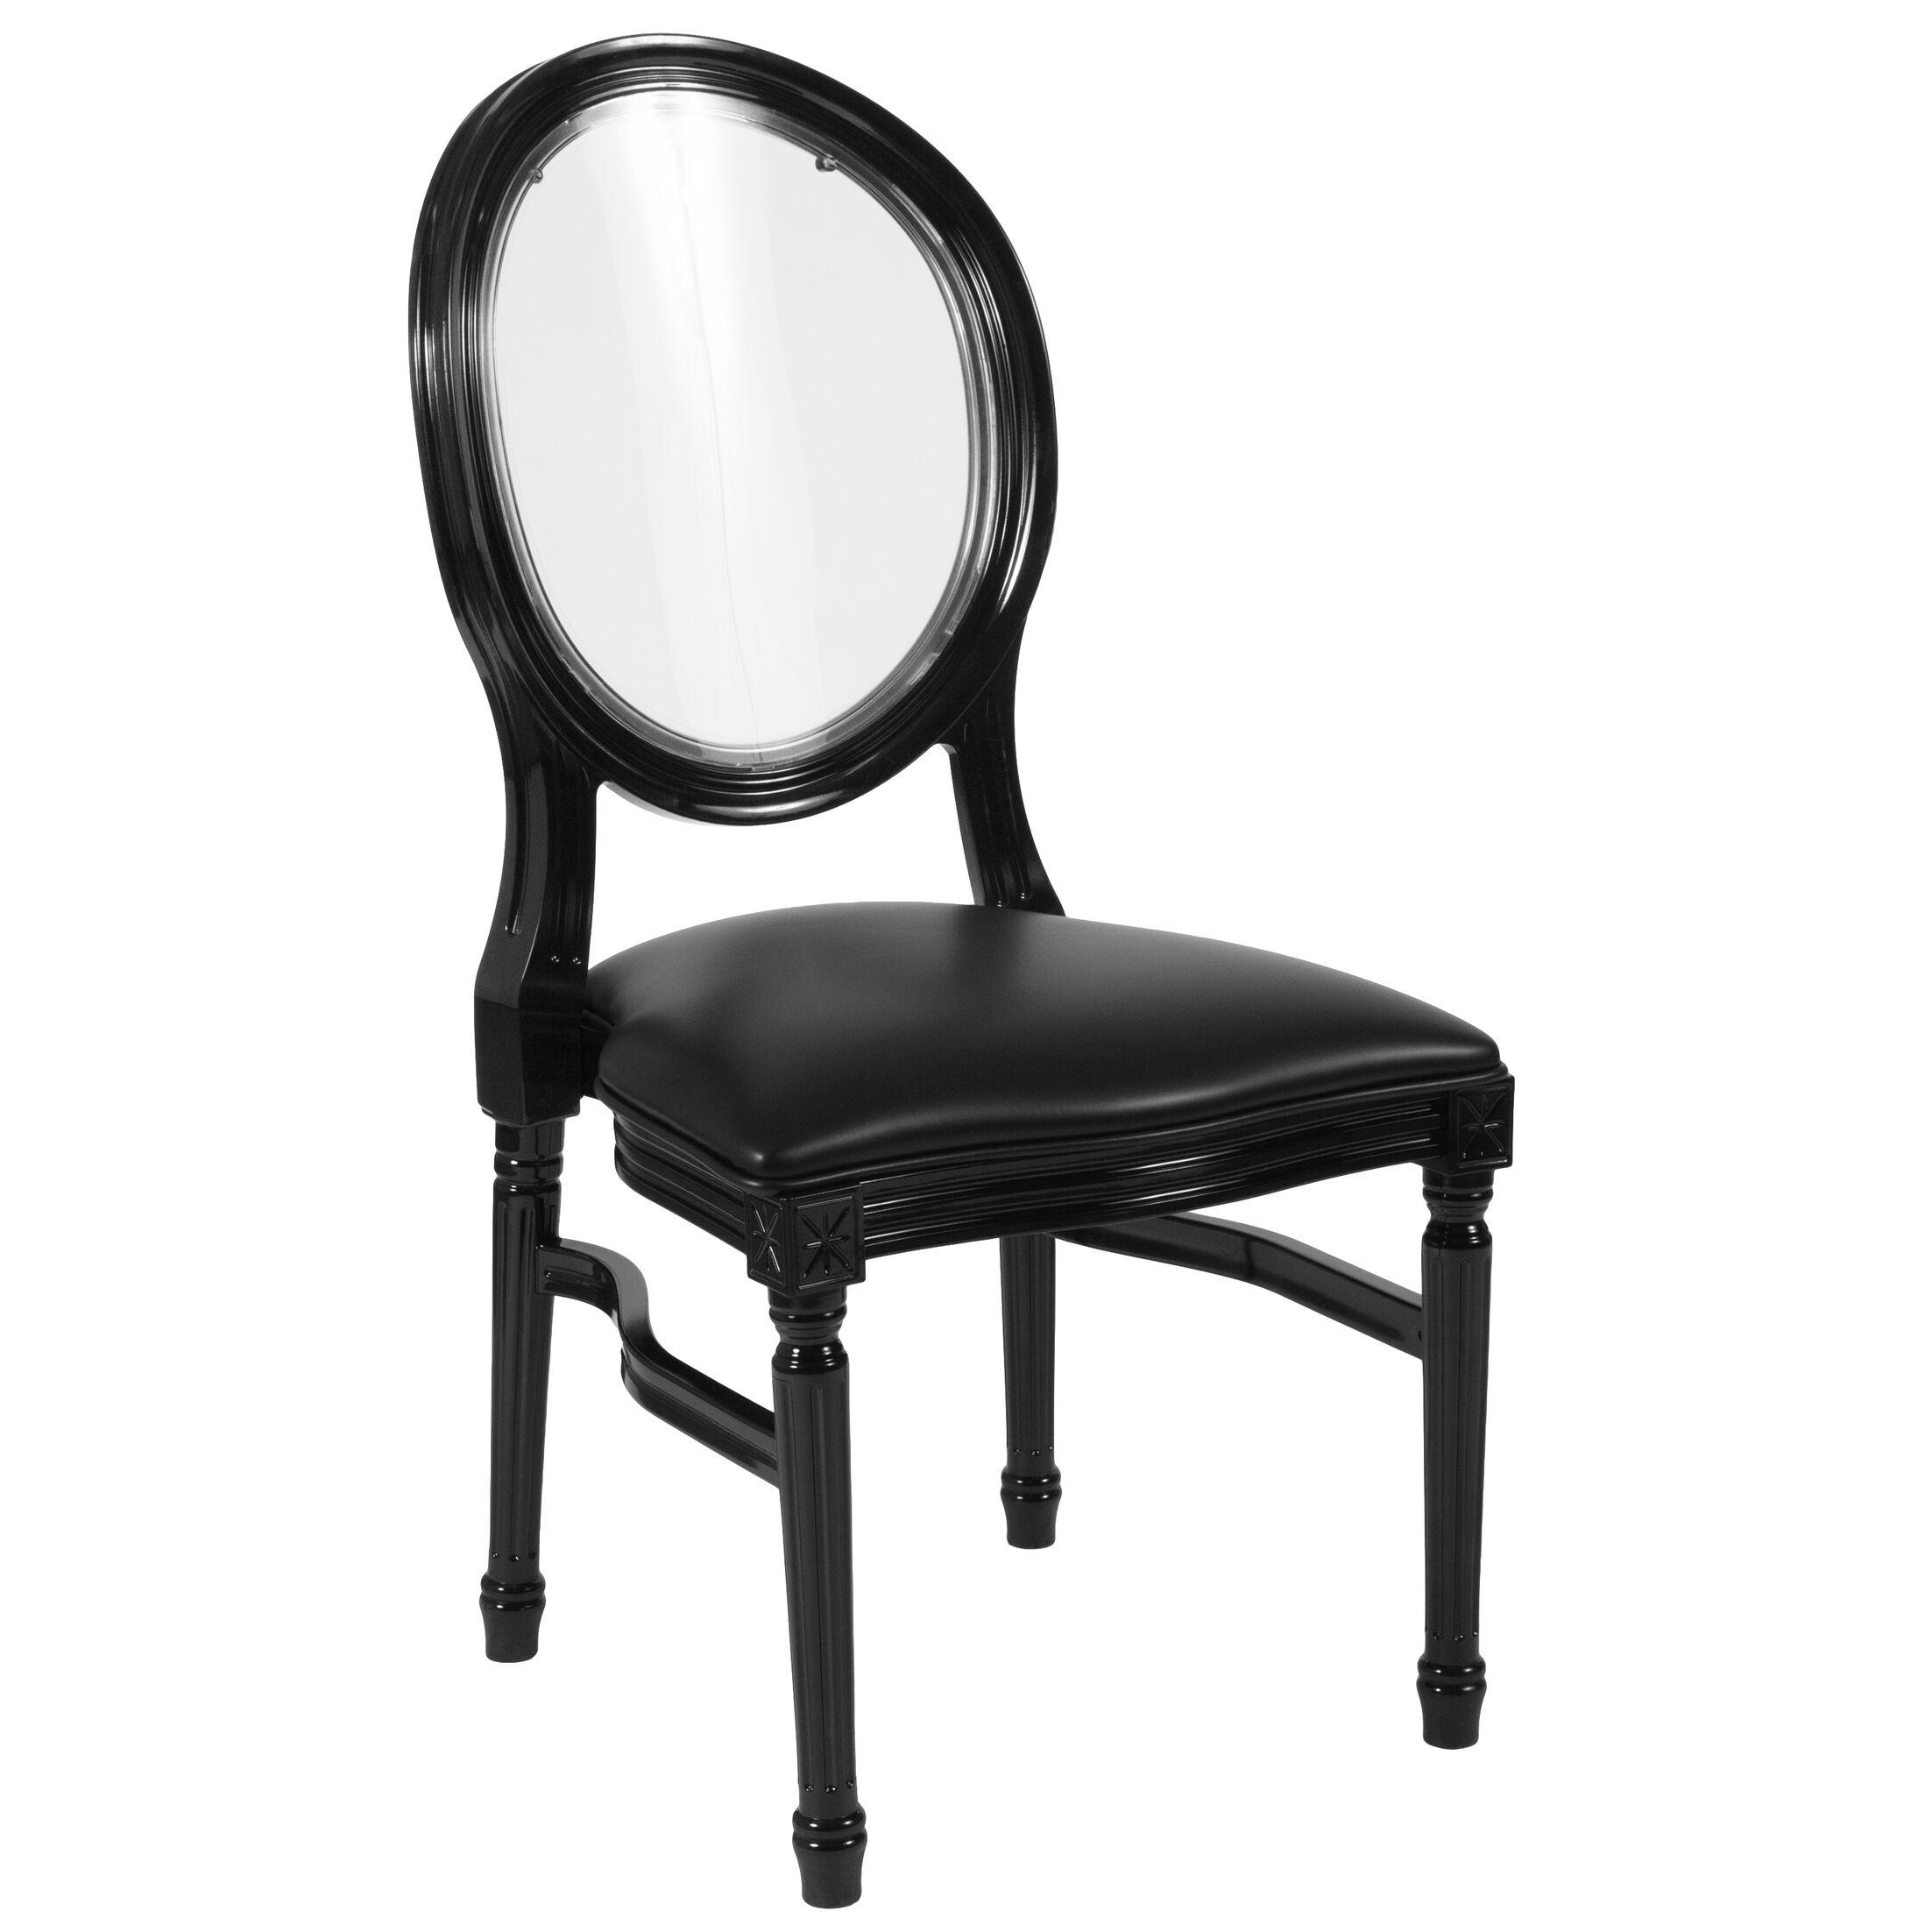 Komar Upholstered Dining Chair Upholstery Color: Transparent, Frame Color: White